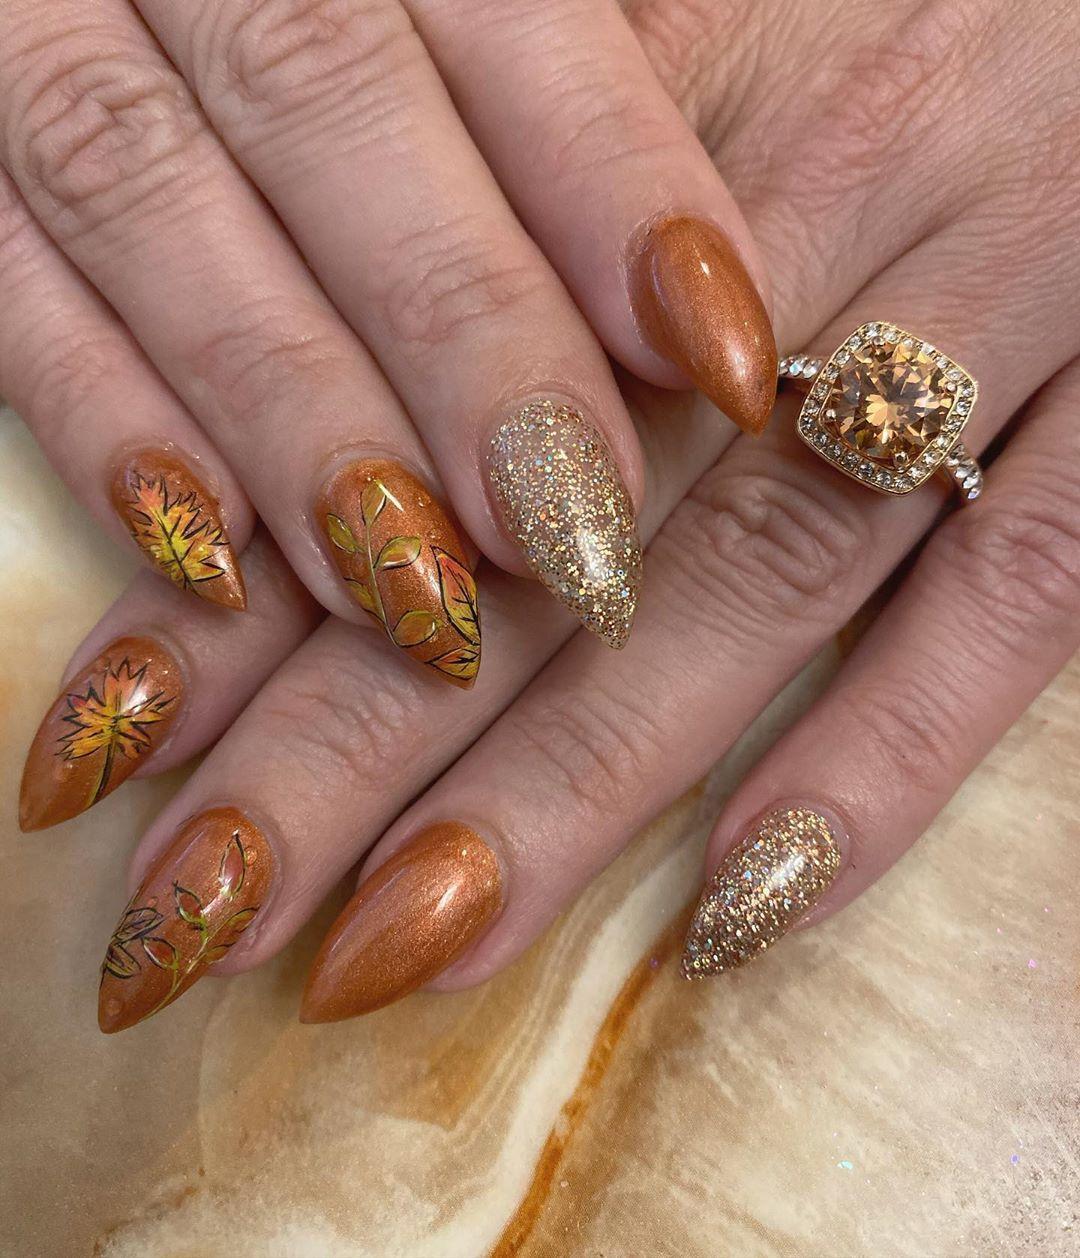 #fallnails #nailsofinstagram #nailsonfleek #polished #foilnails    – Fall Nails Ideas